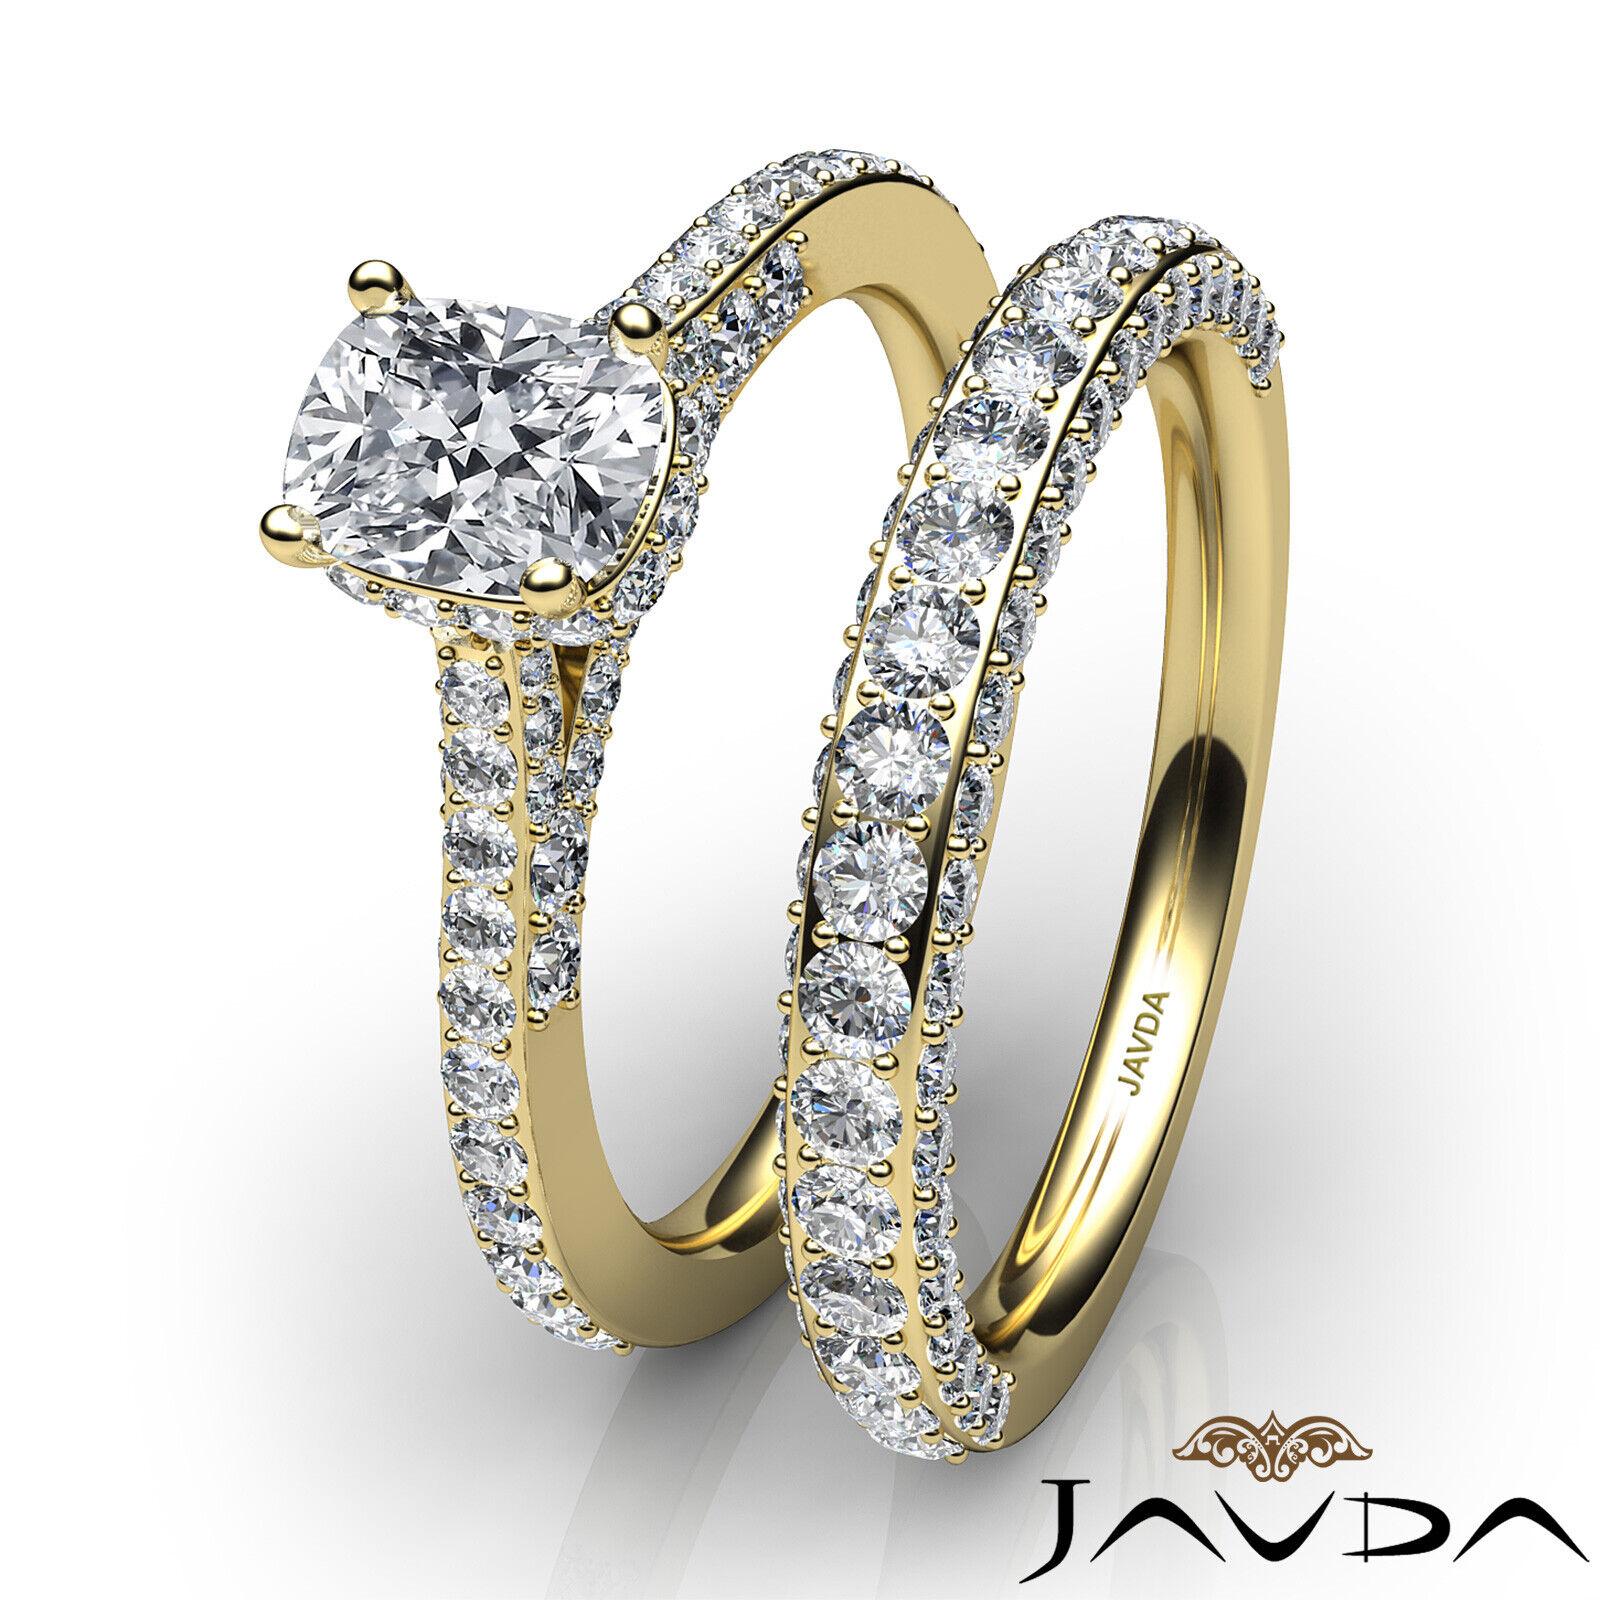 2.85ctw Pave Circa Halo Bridal Cushion Diamond Engagement Ring GIA F-VS1 W Gold 10